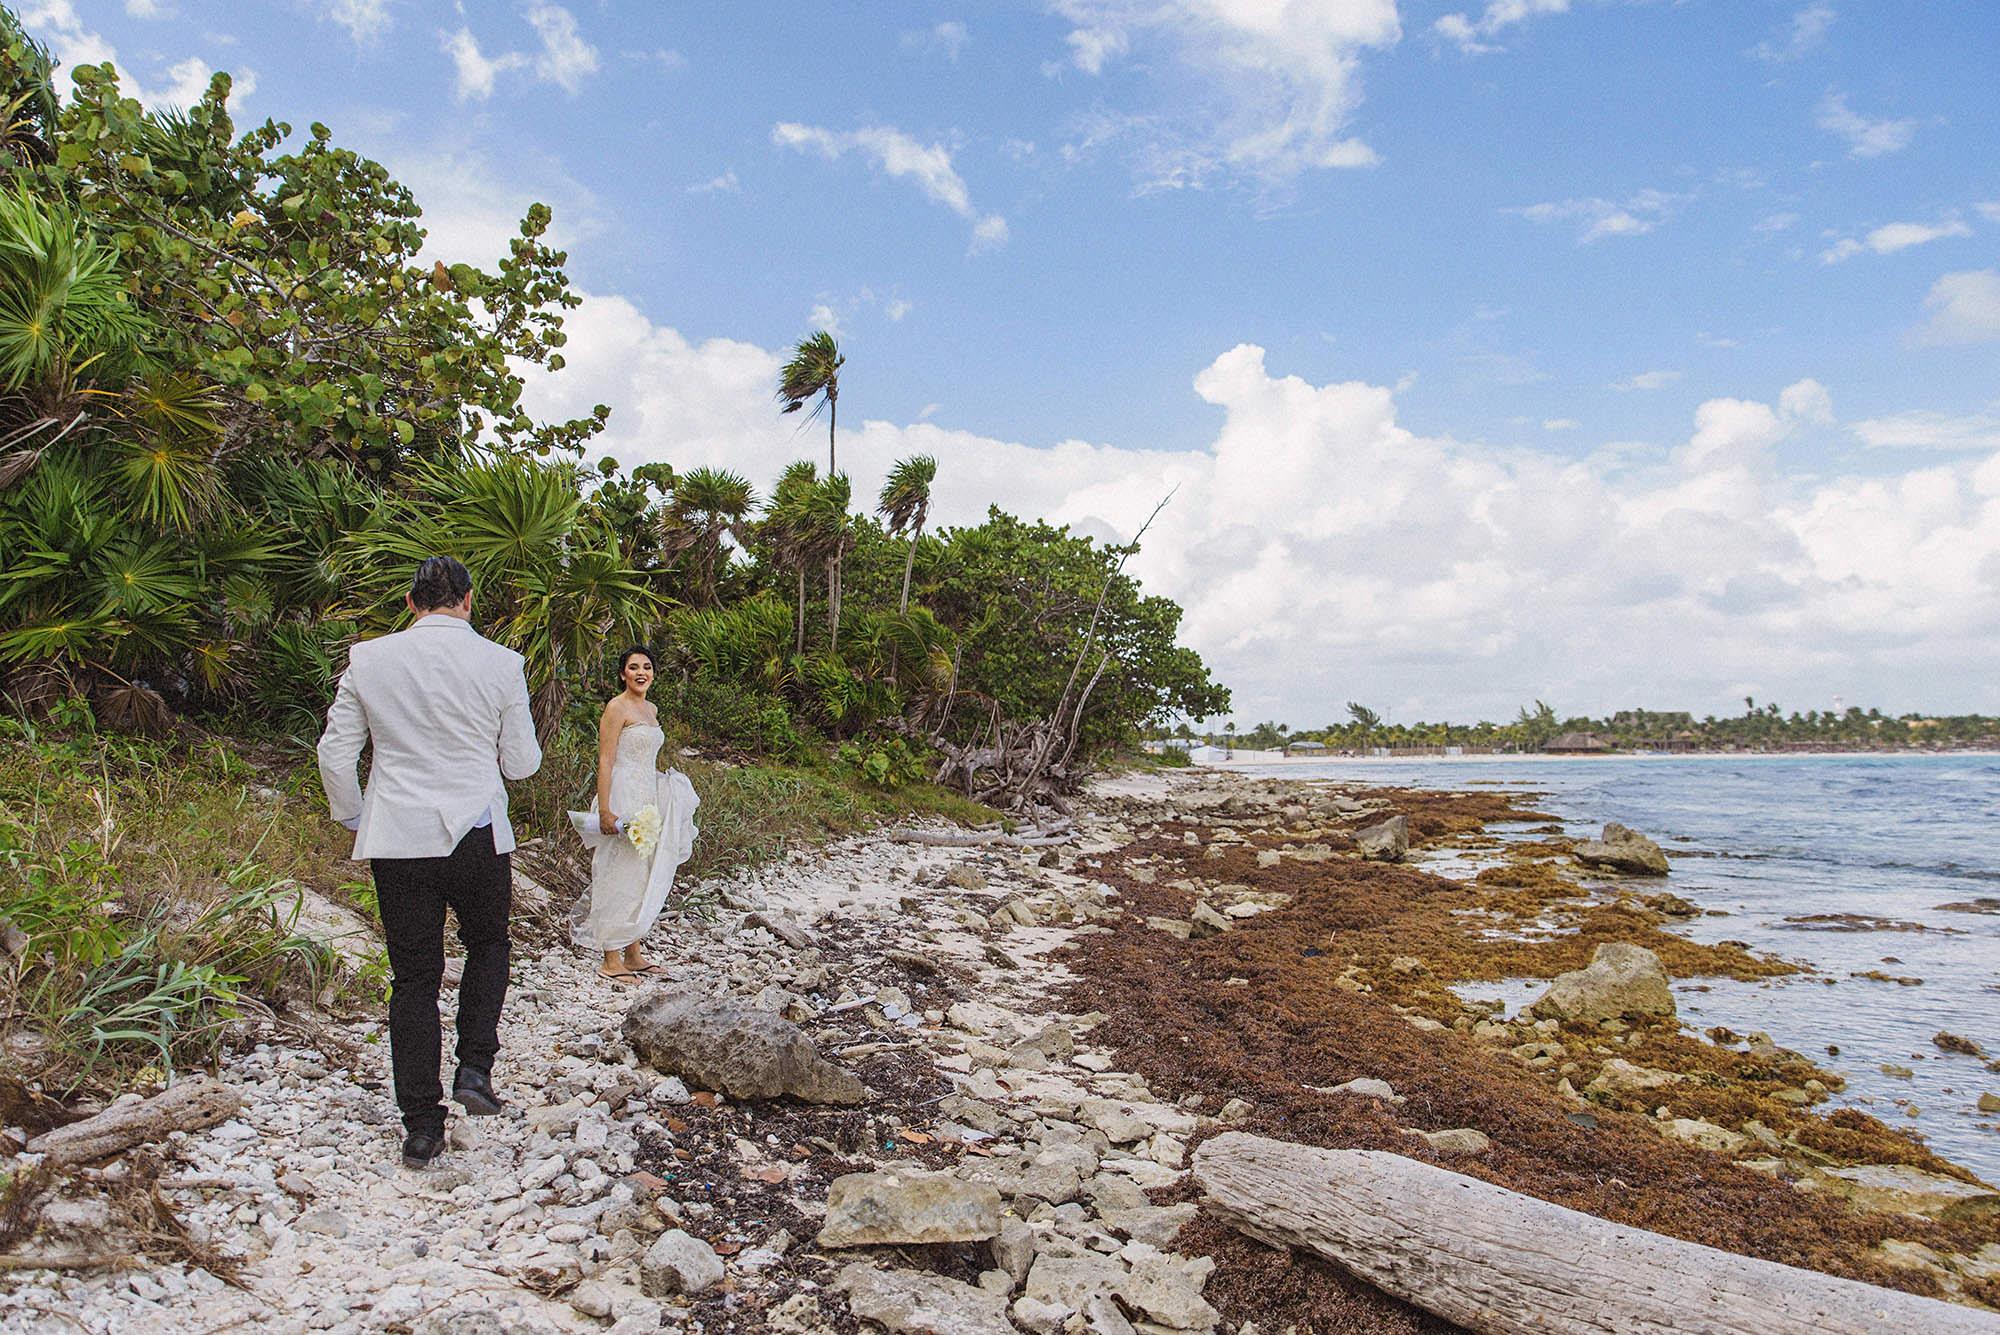 Wedding playa del carmen planner destination mexico magali espinosa27-WEB.jpg